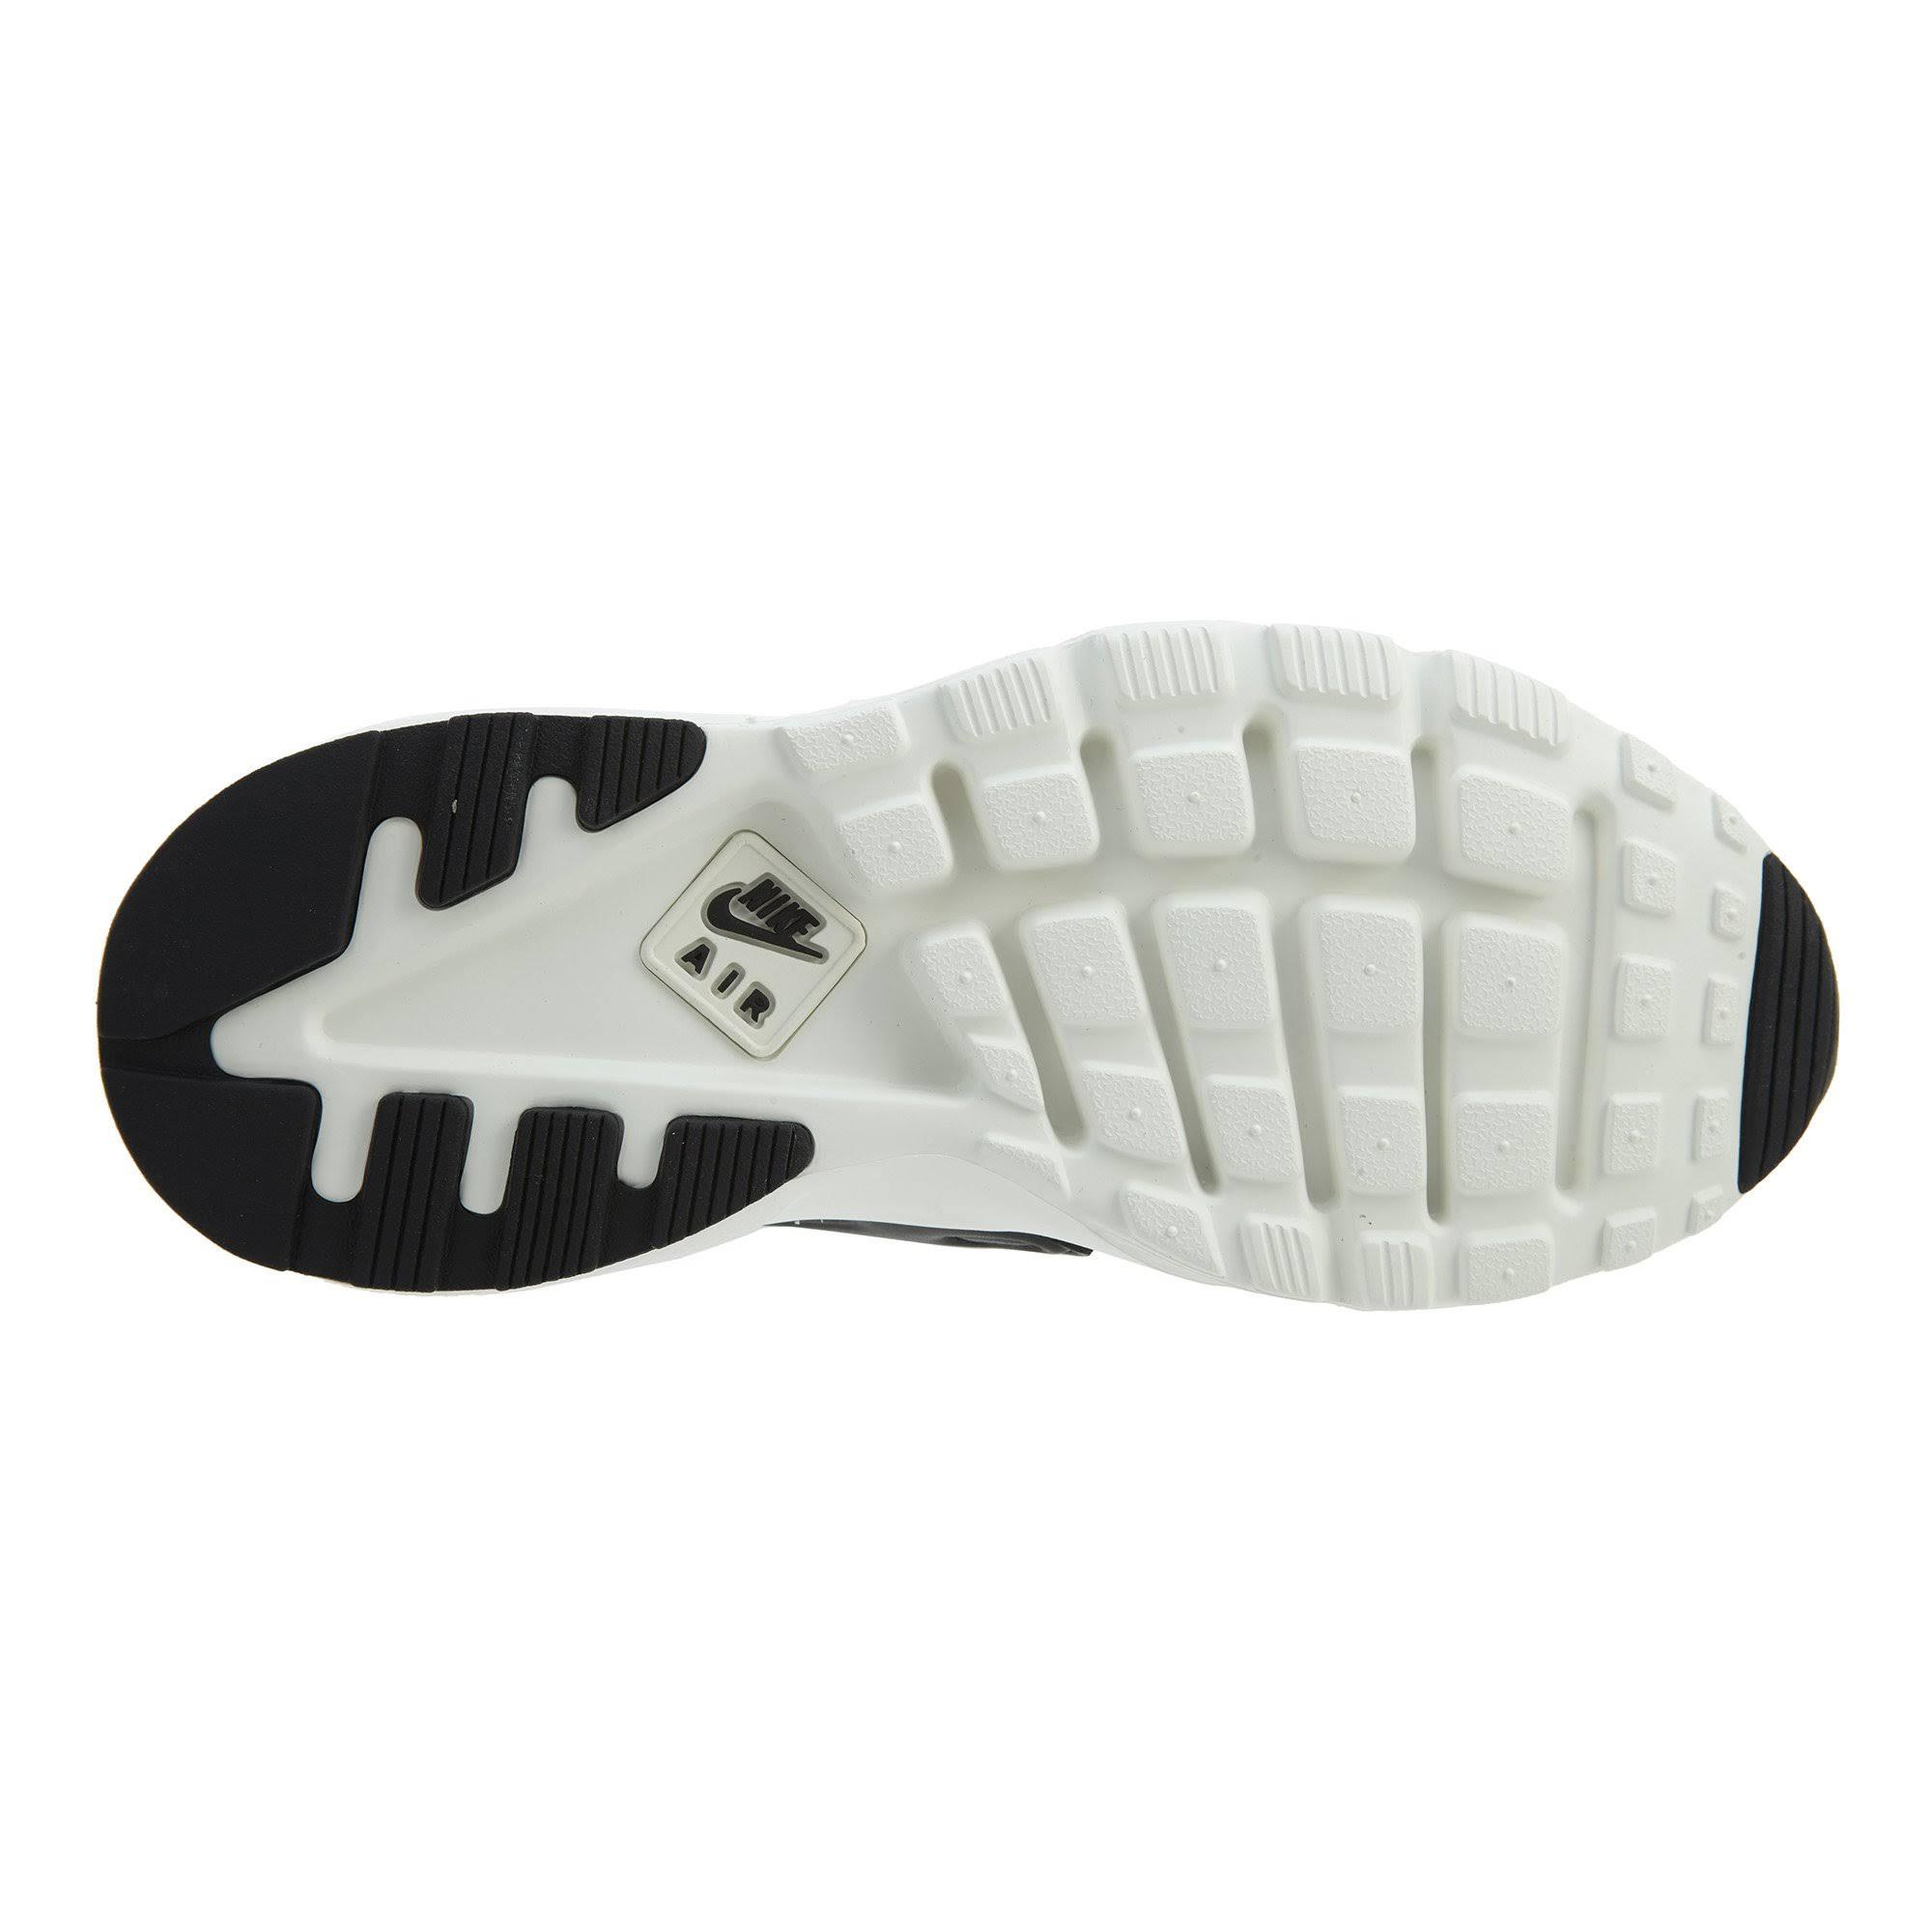 875841 Damen Huarache Schwarz Style Ultra Dunkelgrau Nike 008 Segel Air Run wOqPZZY